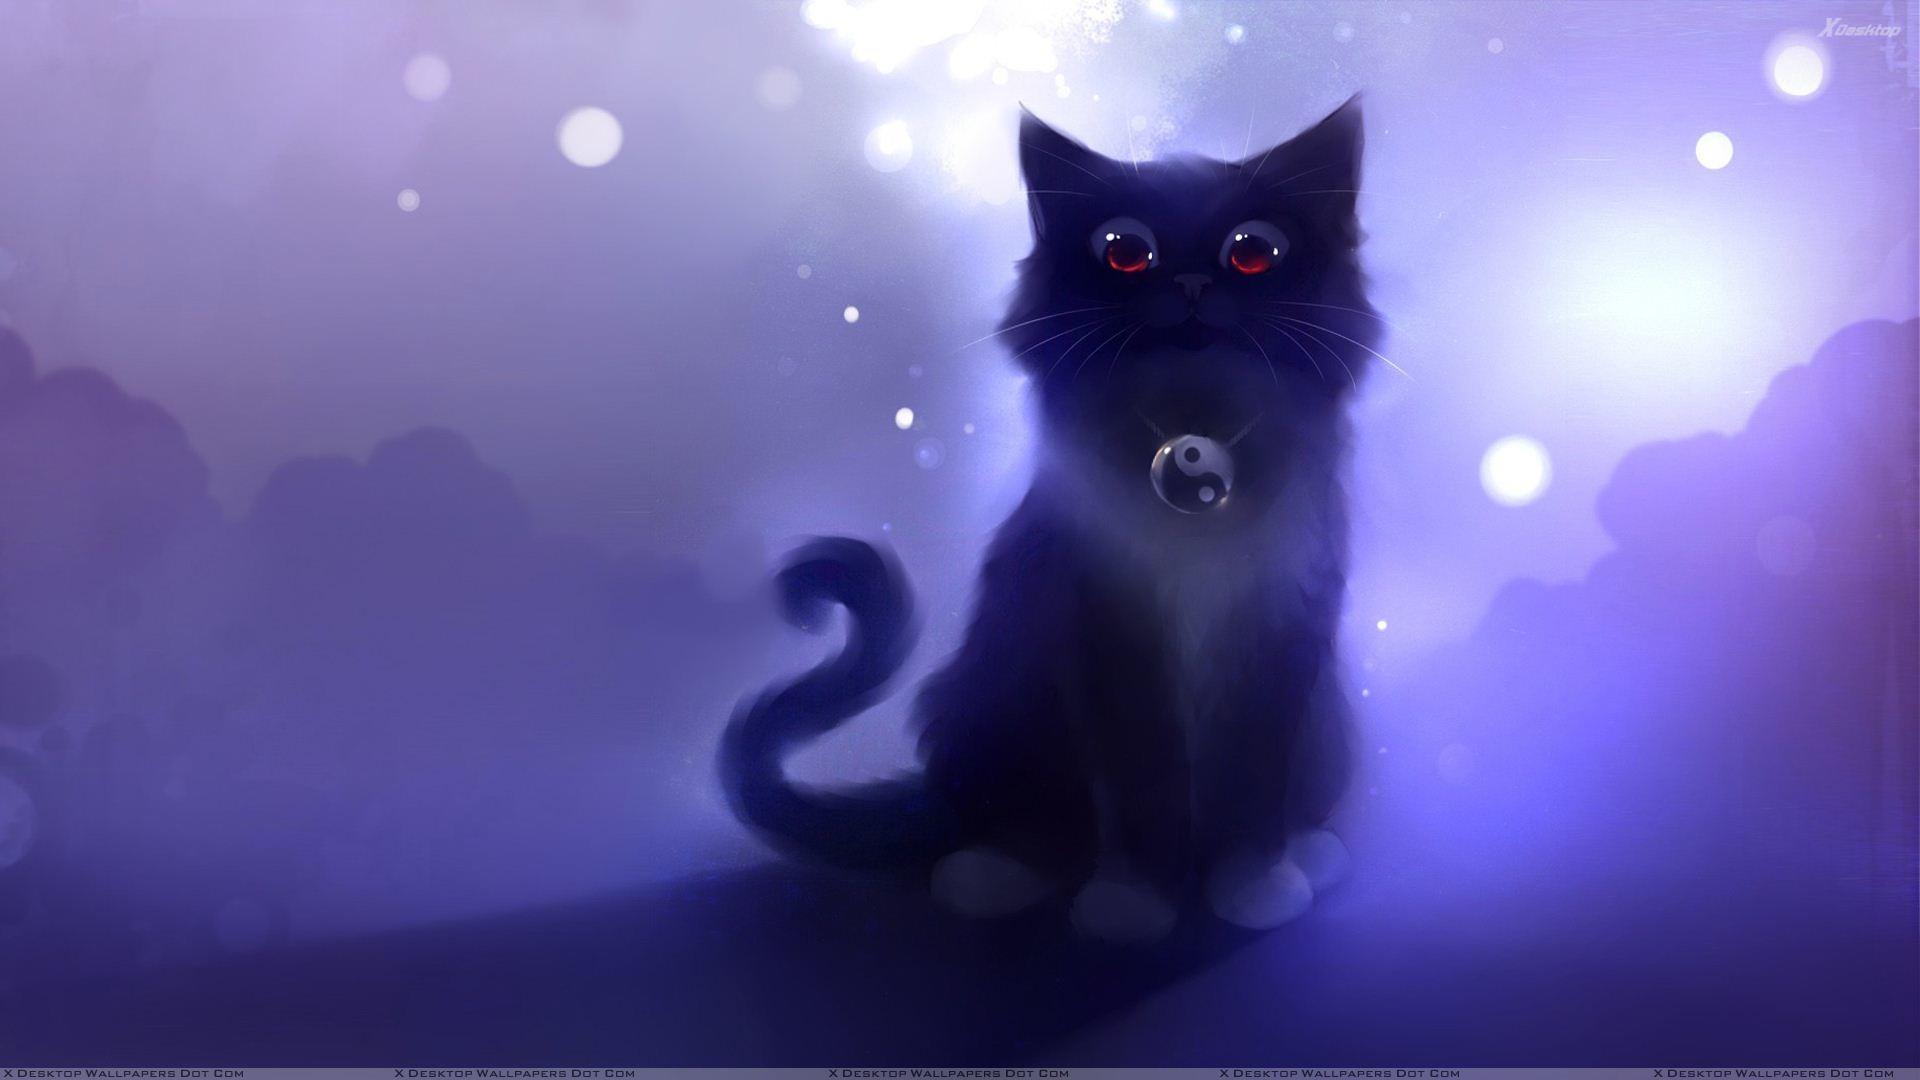 Cartoon Black Cat Sitting Wallpaper